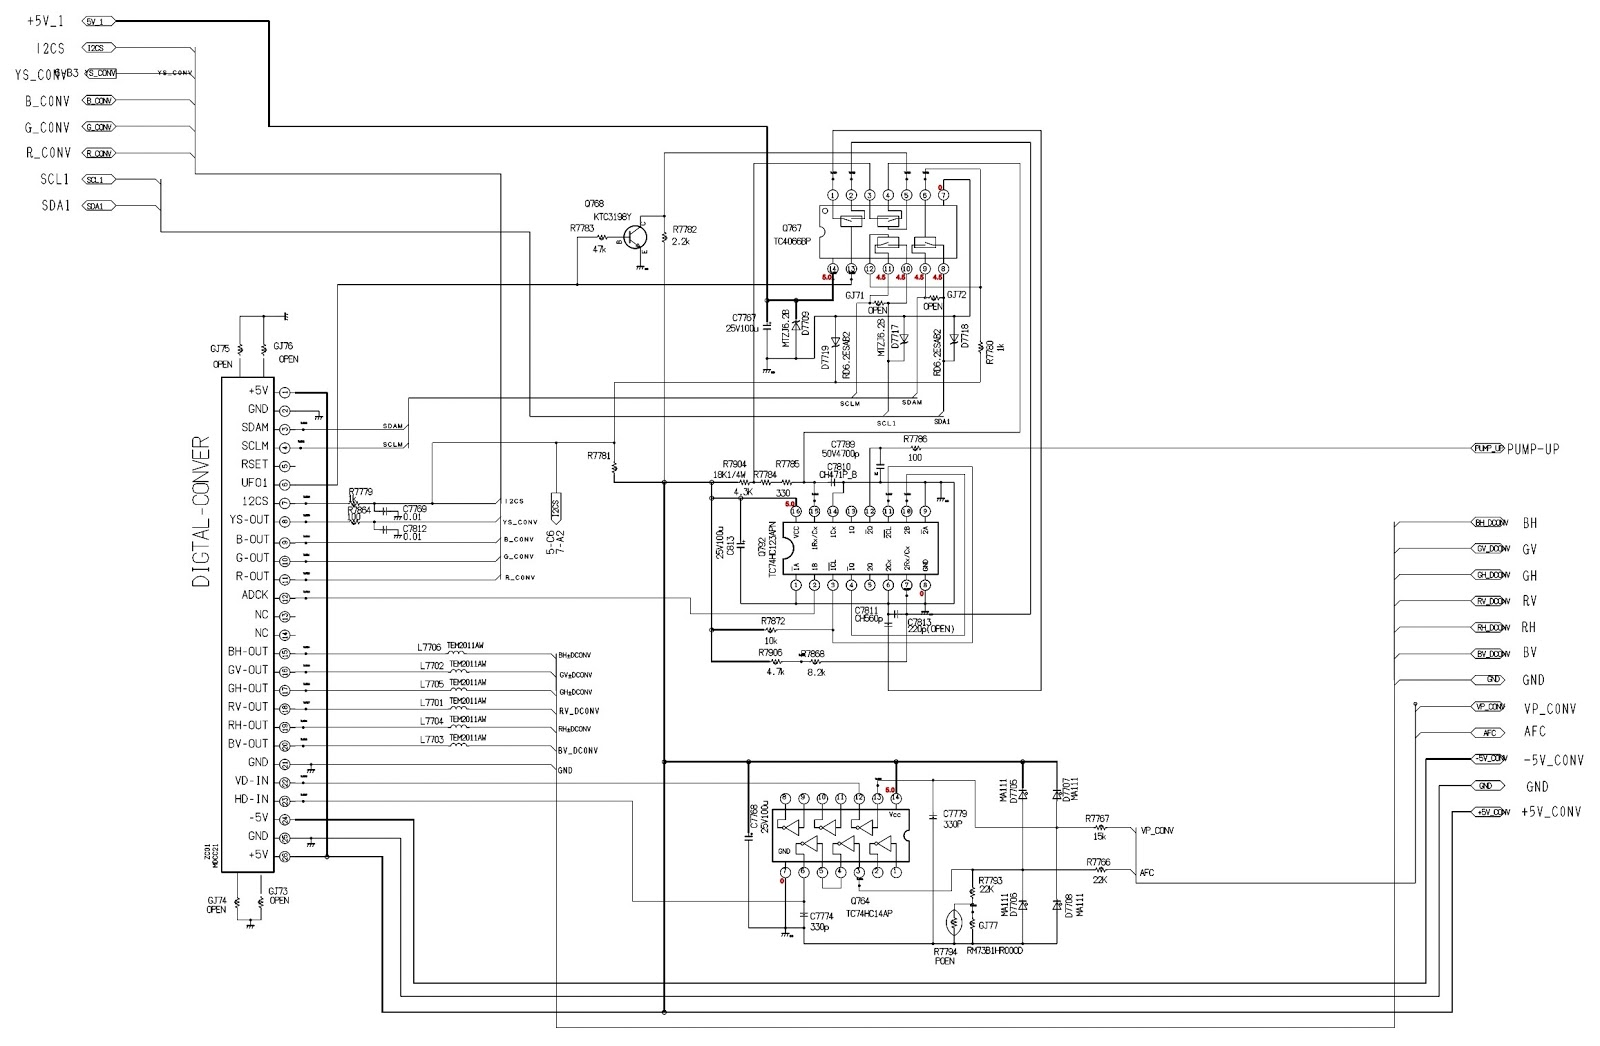 toshiba tv parts diagram toshiba 50 inch projection tv - smps schematic | electro help toshiba tv schematic diagrams